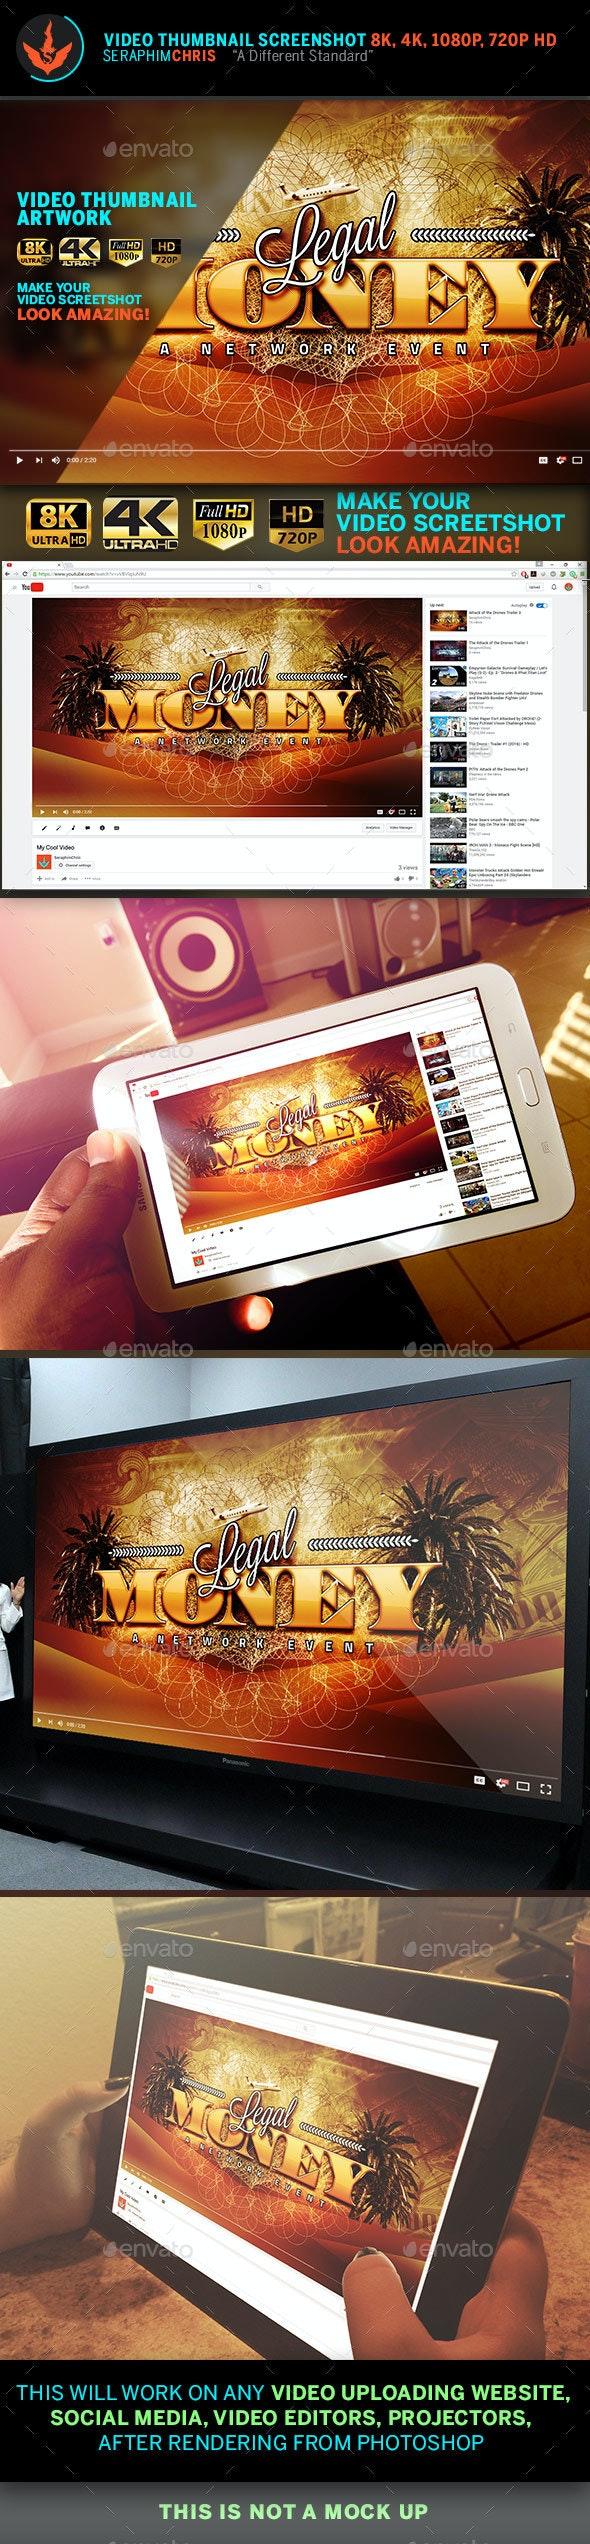 Legal Money YouTube Video Thumbnail Screenshot Template - YouTube Social Media